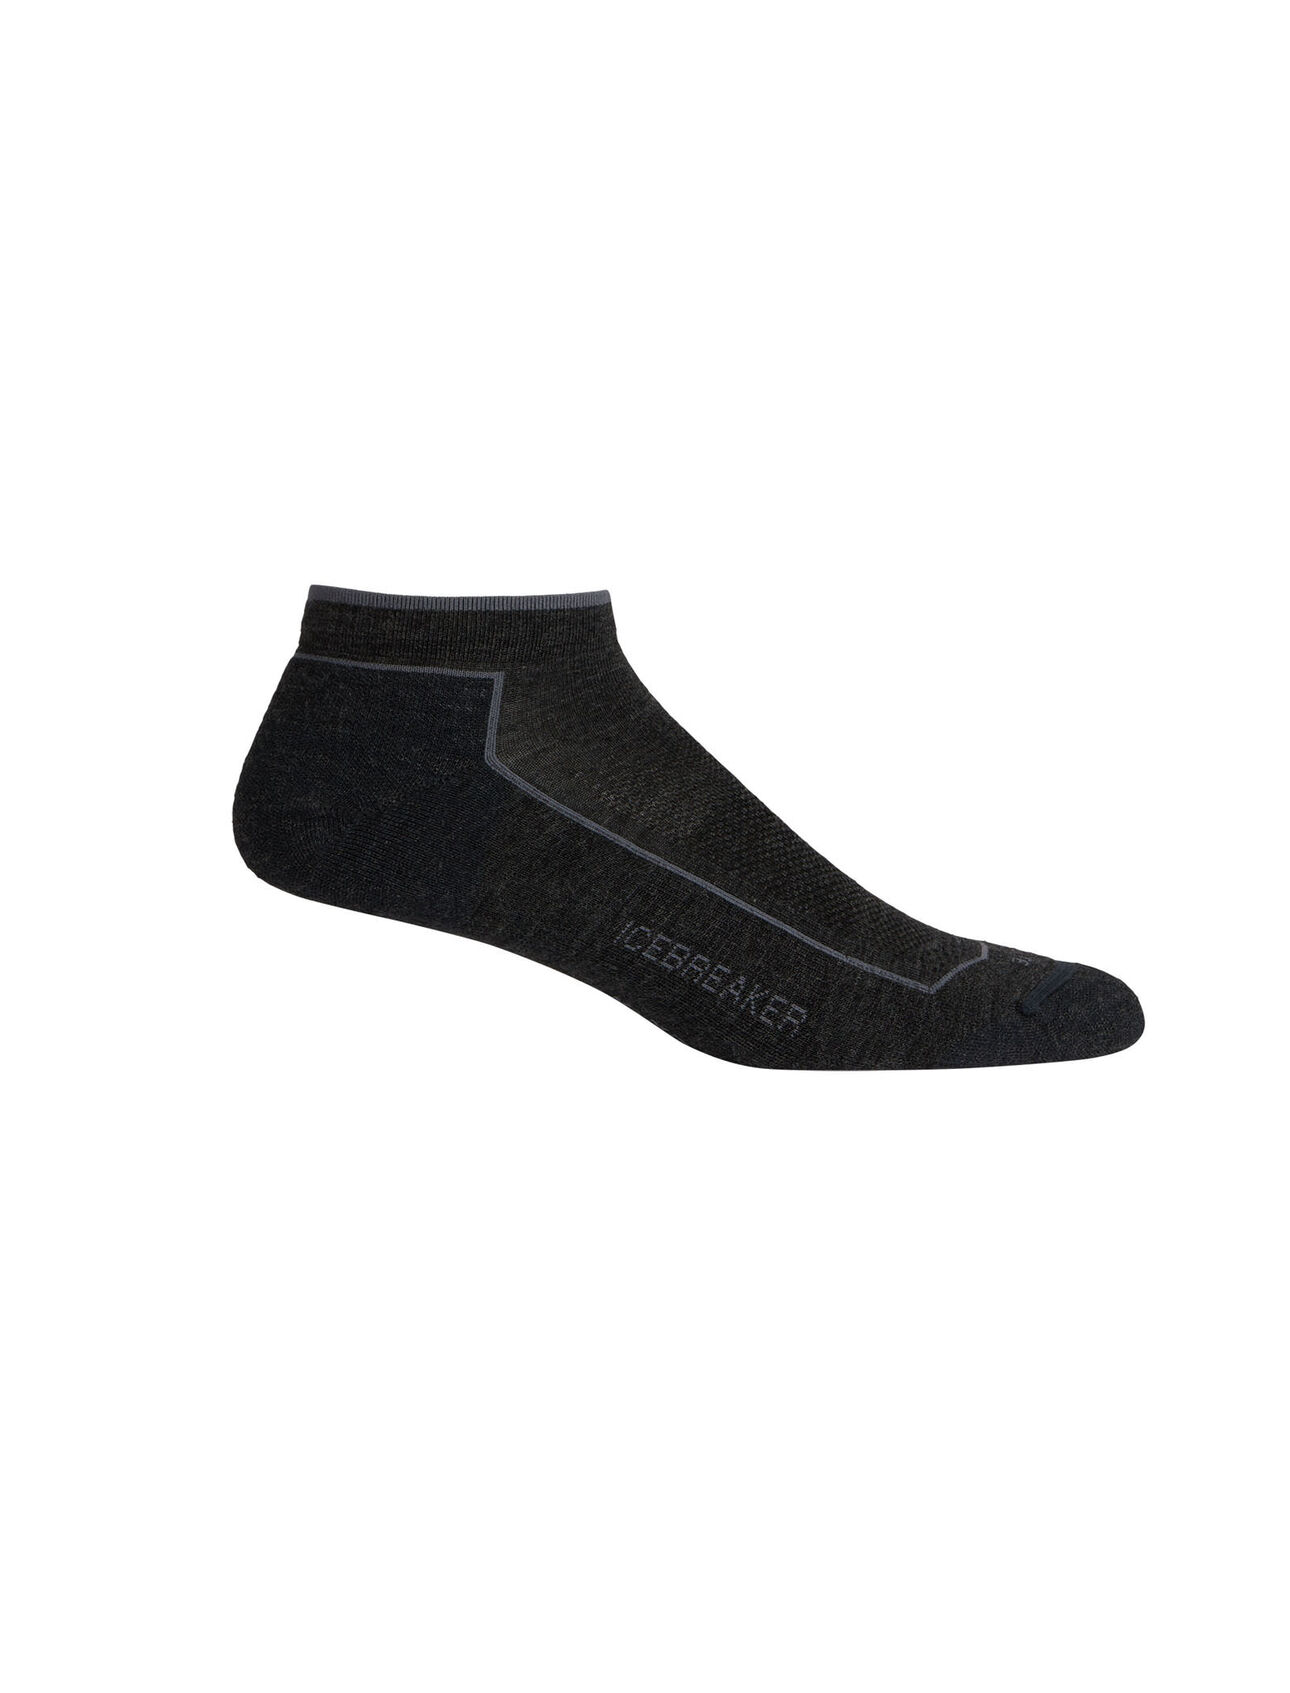 Cool-Lite™ Merino Hike Low Cut Socks